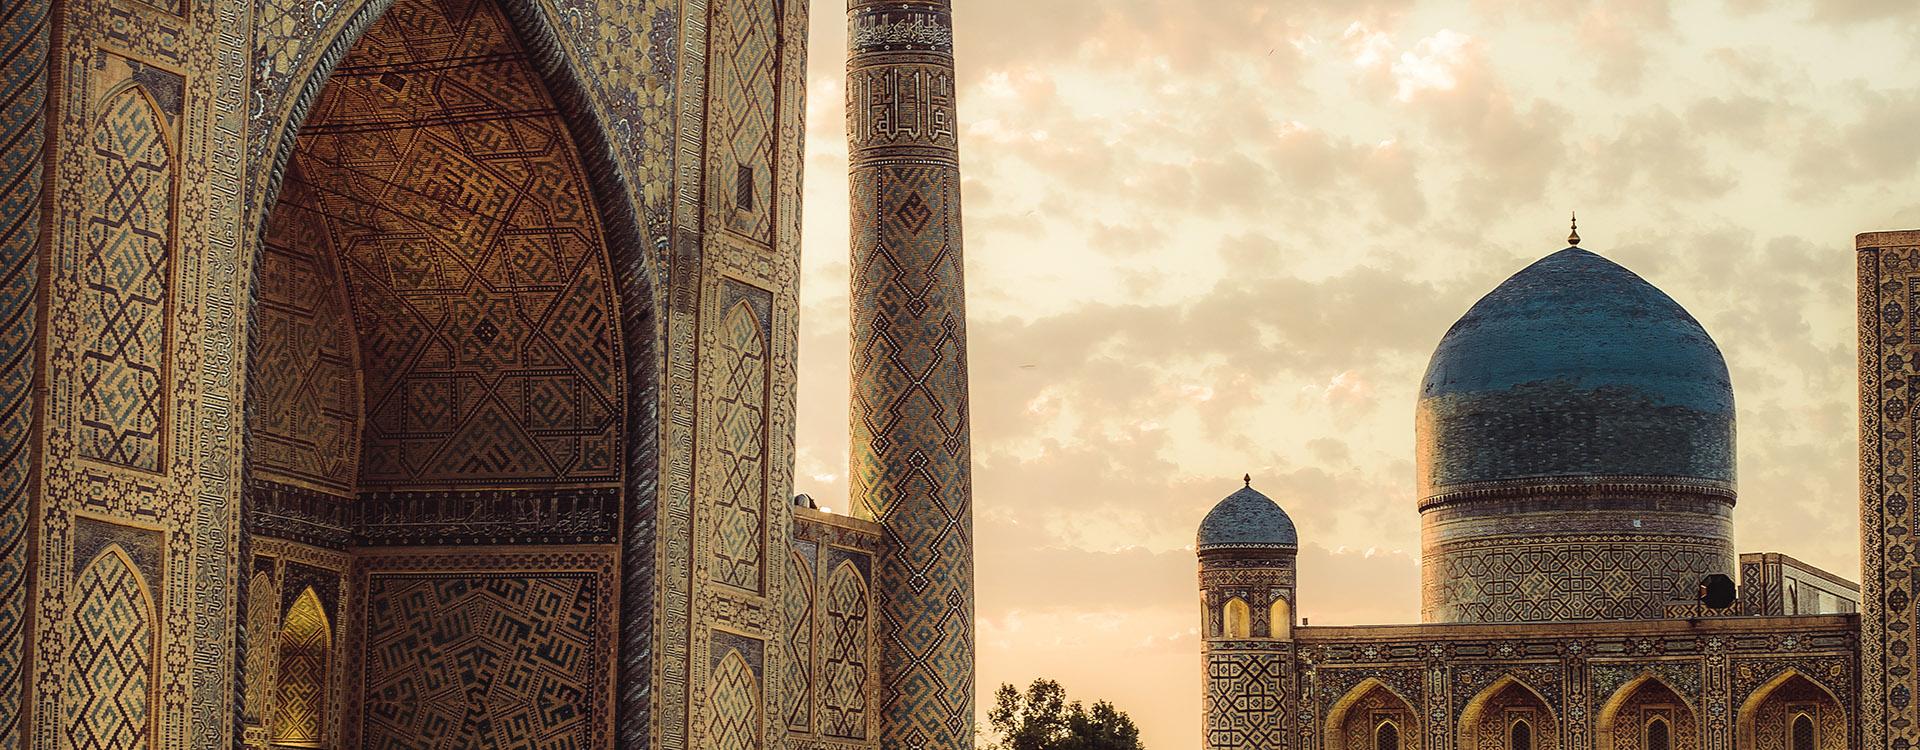 Uzbekistan (Samarkand mosque) Bibi-Xonim masjidi, central Asia